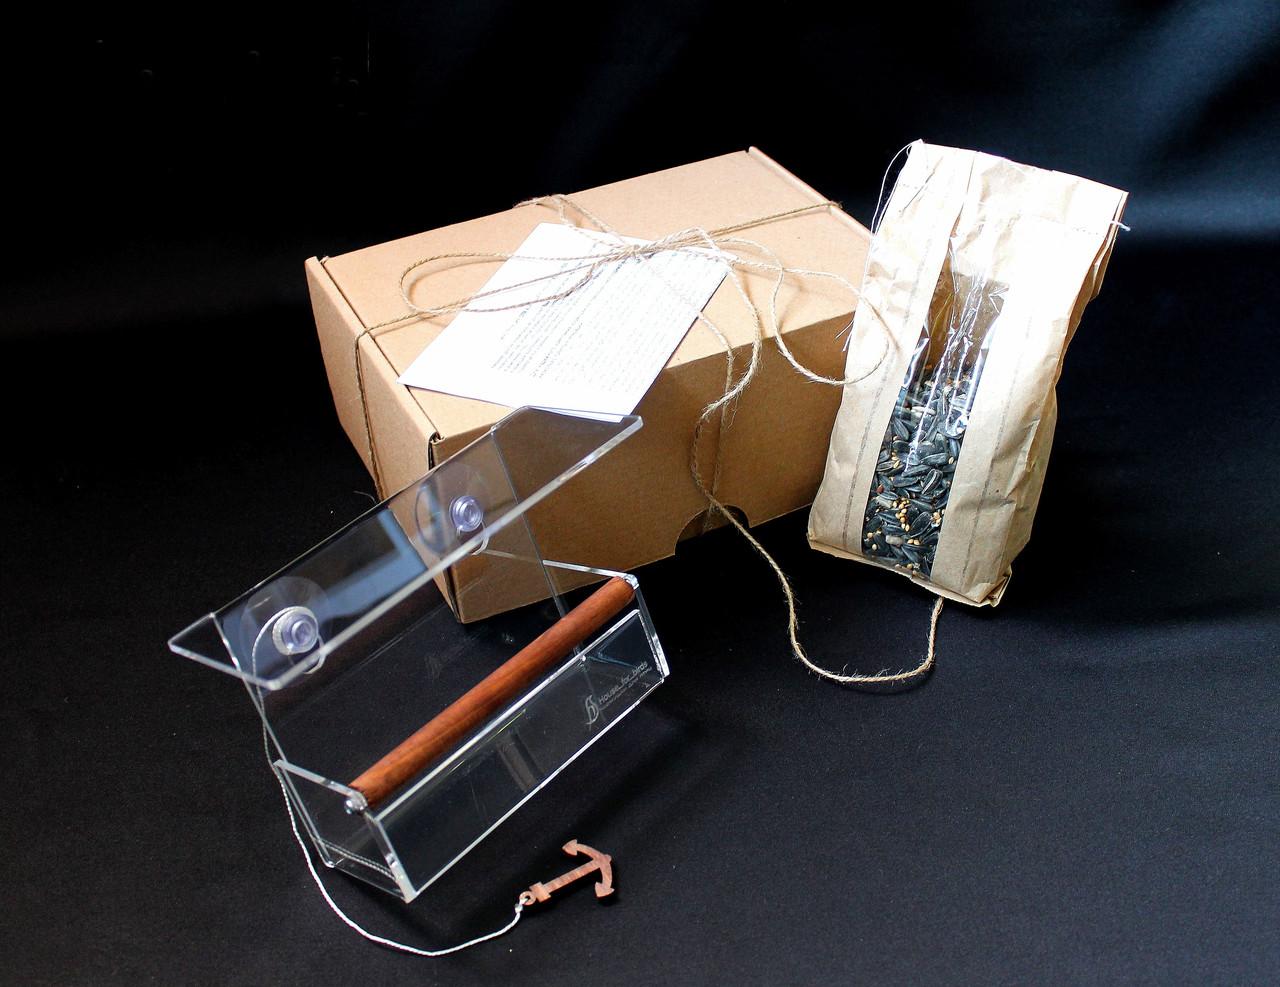 Кормушка для птиц на окно в коробке подарочной с присосками Лоджия